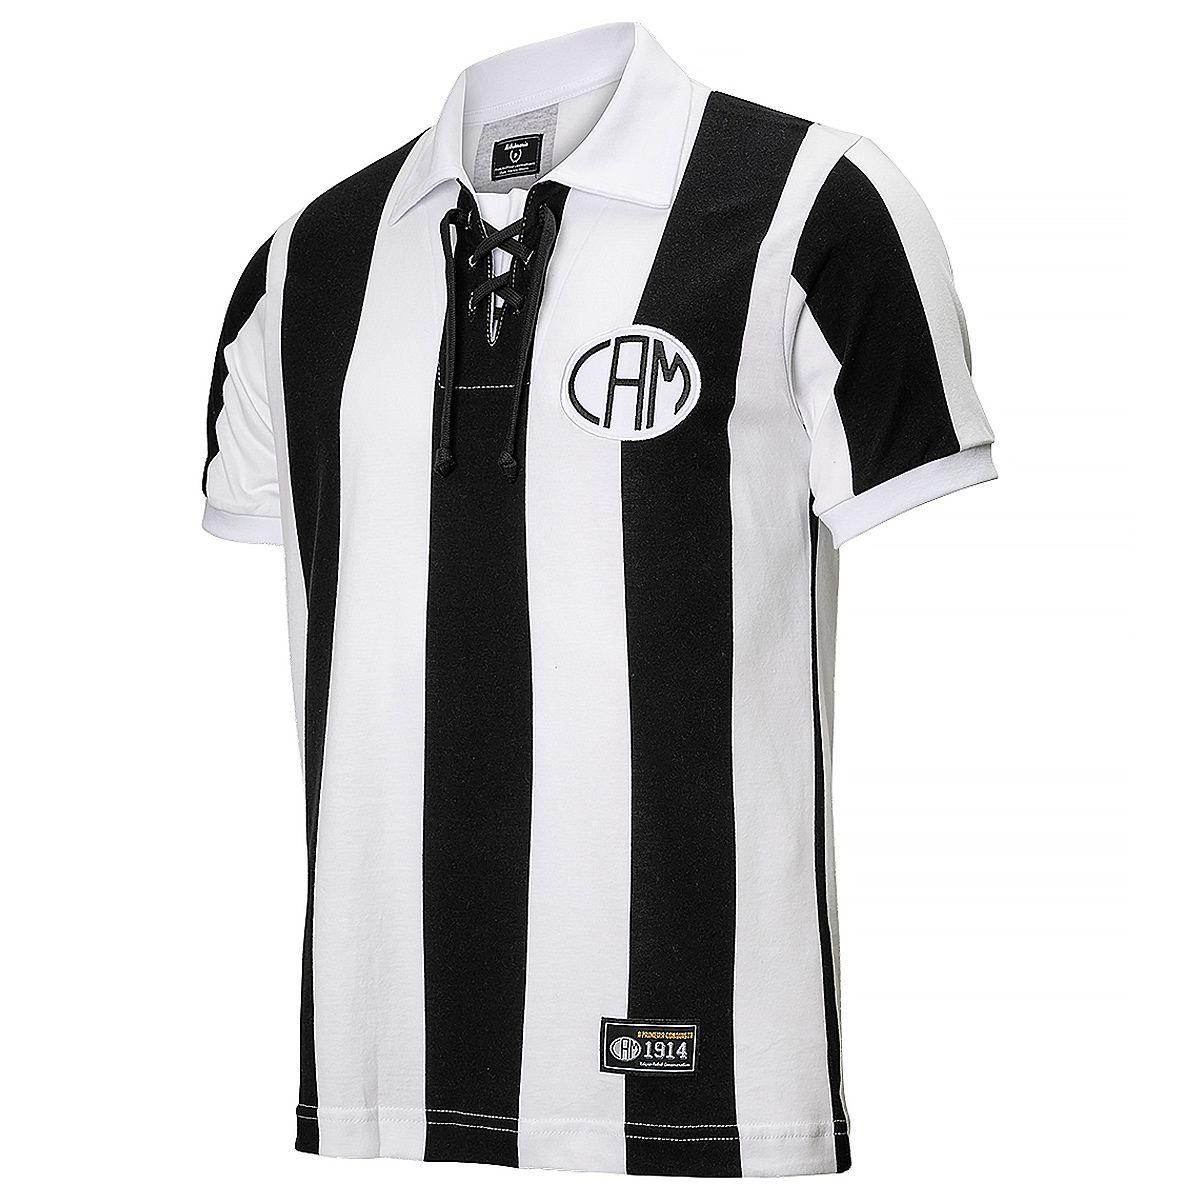 Camisa Atlético Mineiro Retrô 1914